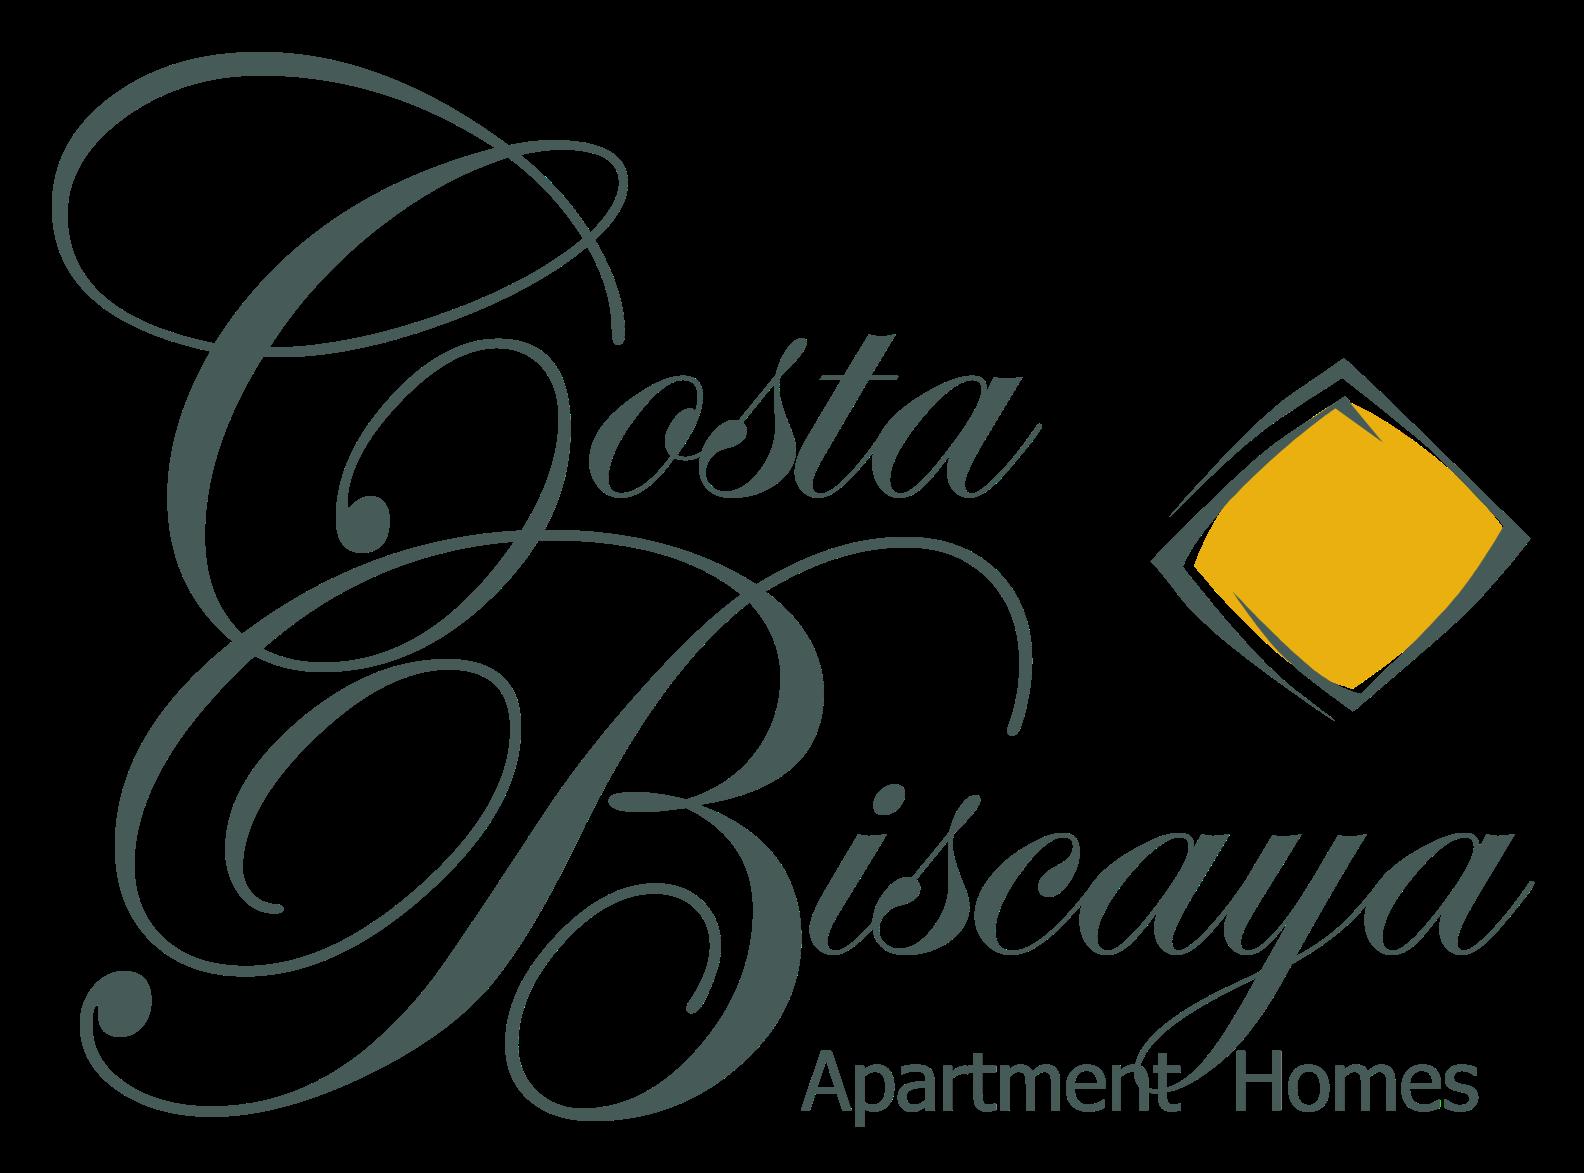 Costa Biscaya Property Logo 10